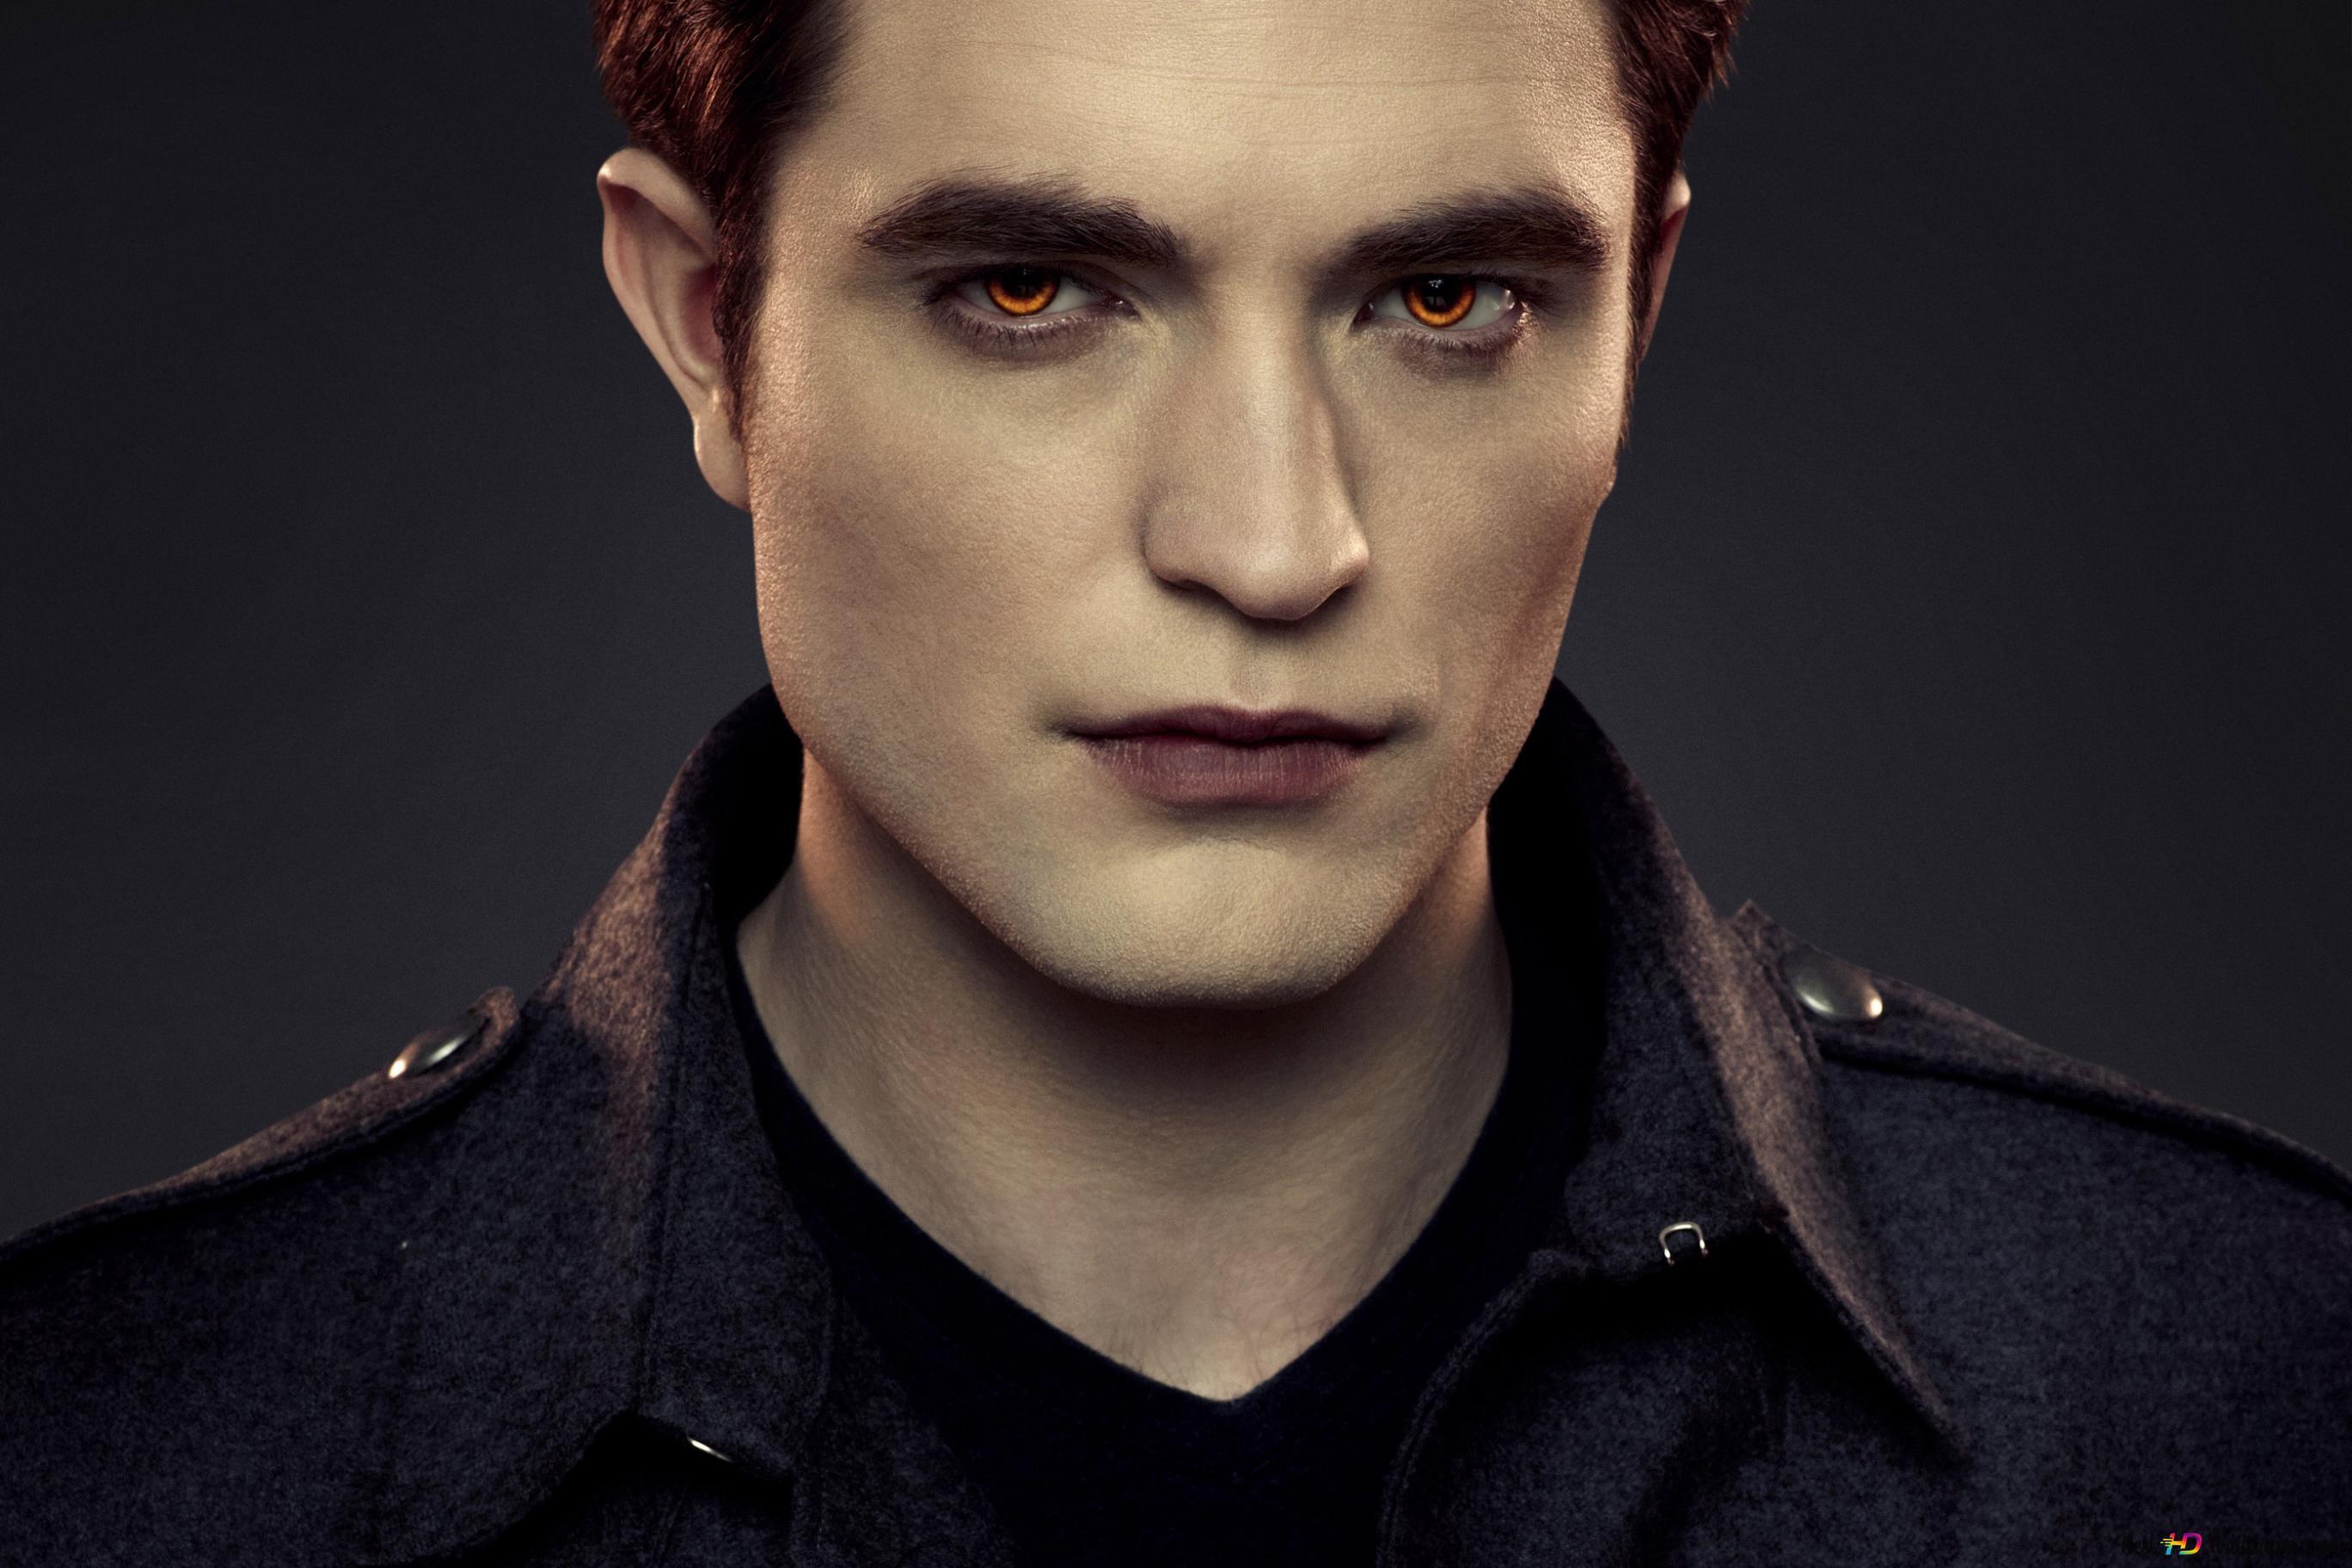 cullen vampire backgrounds - HD1920×1200